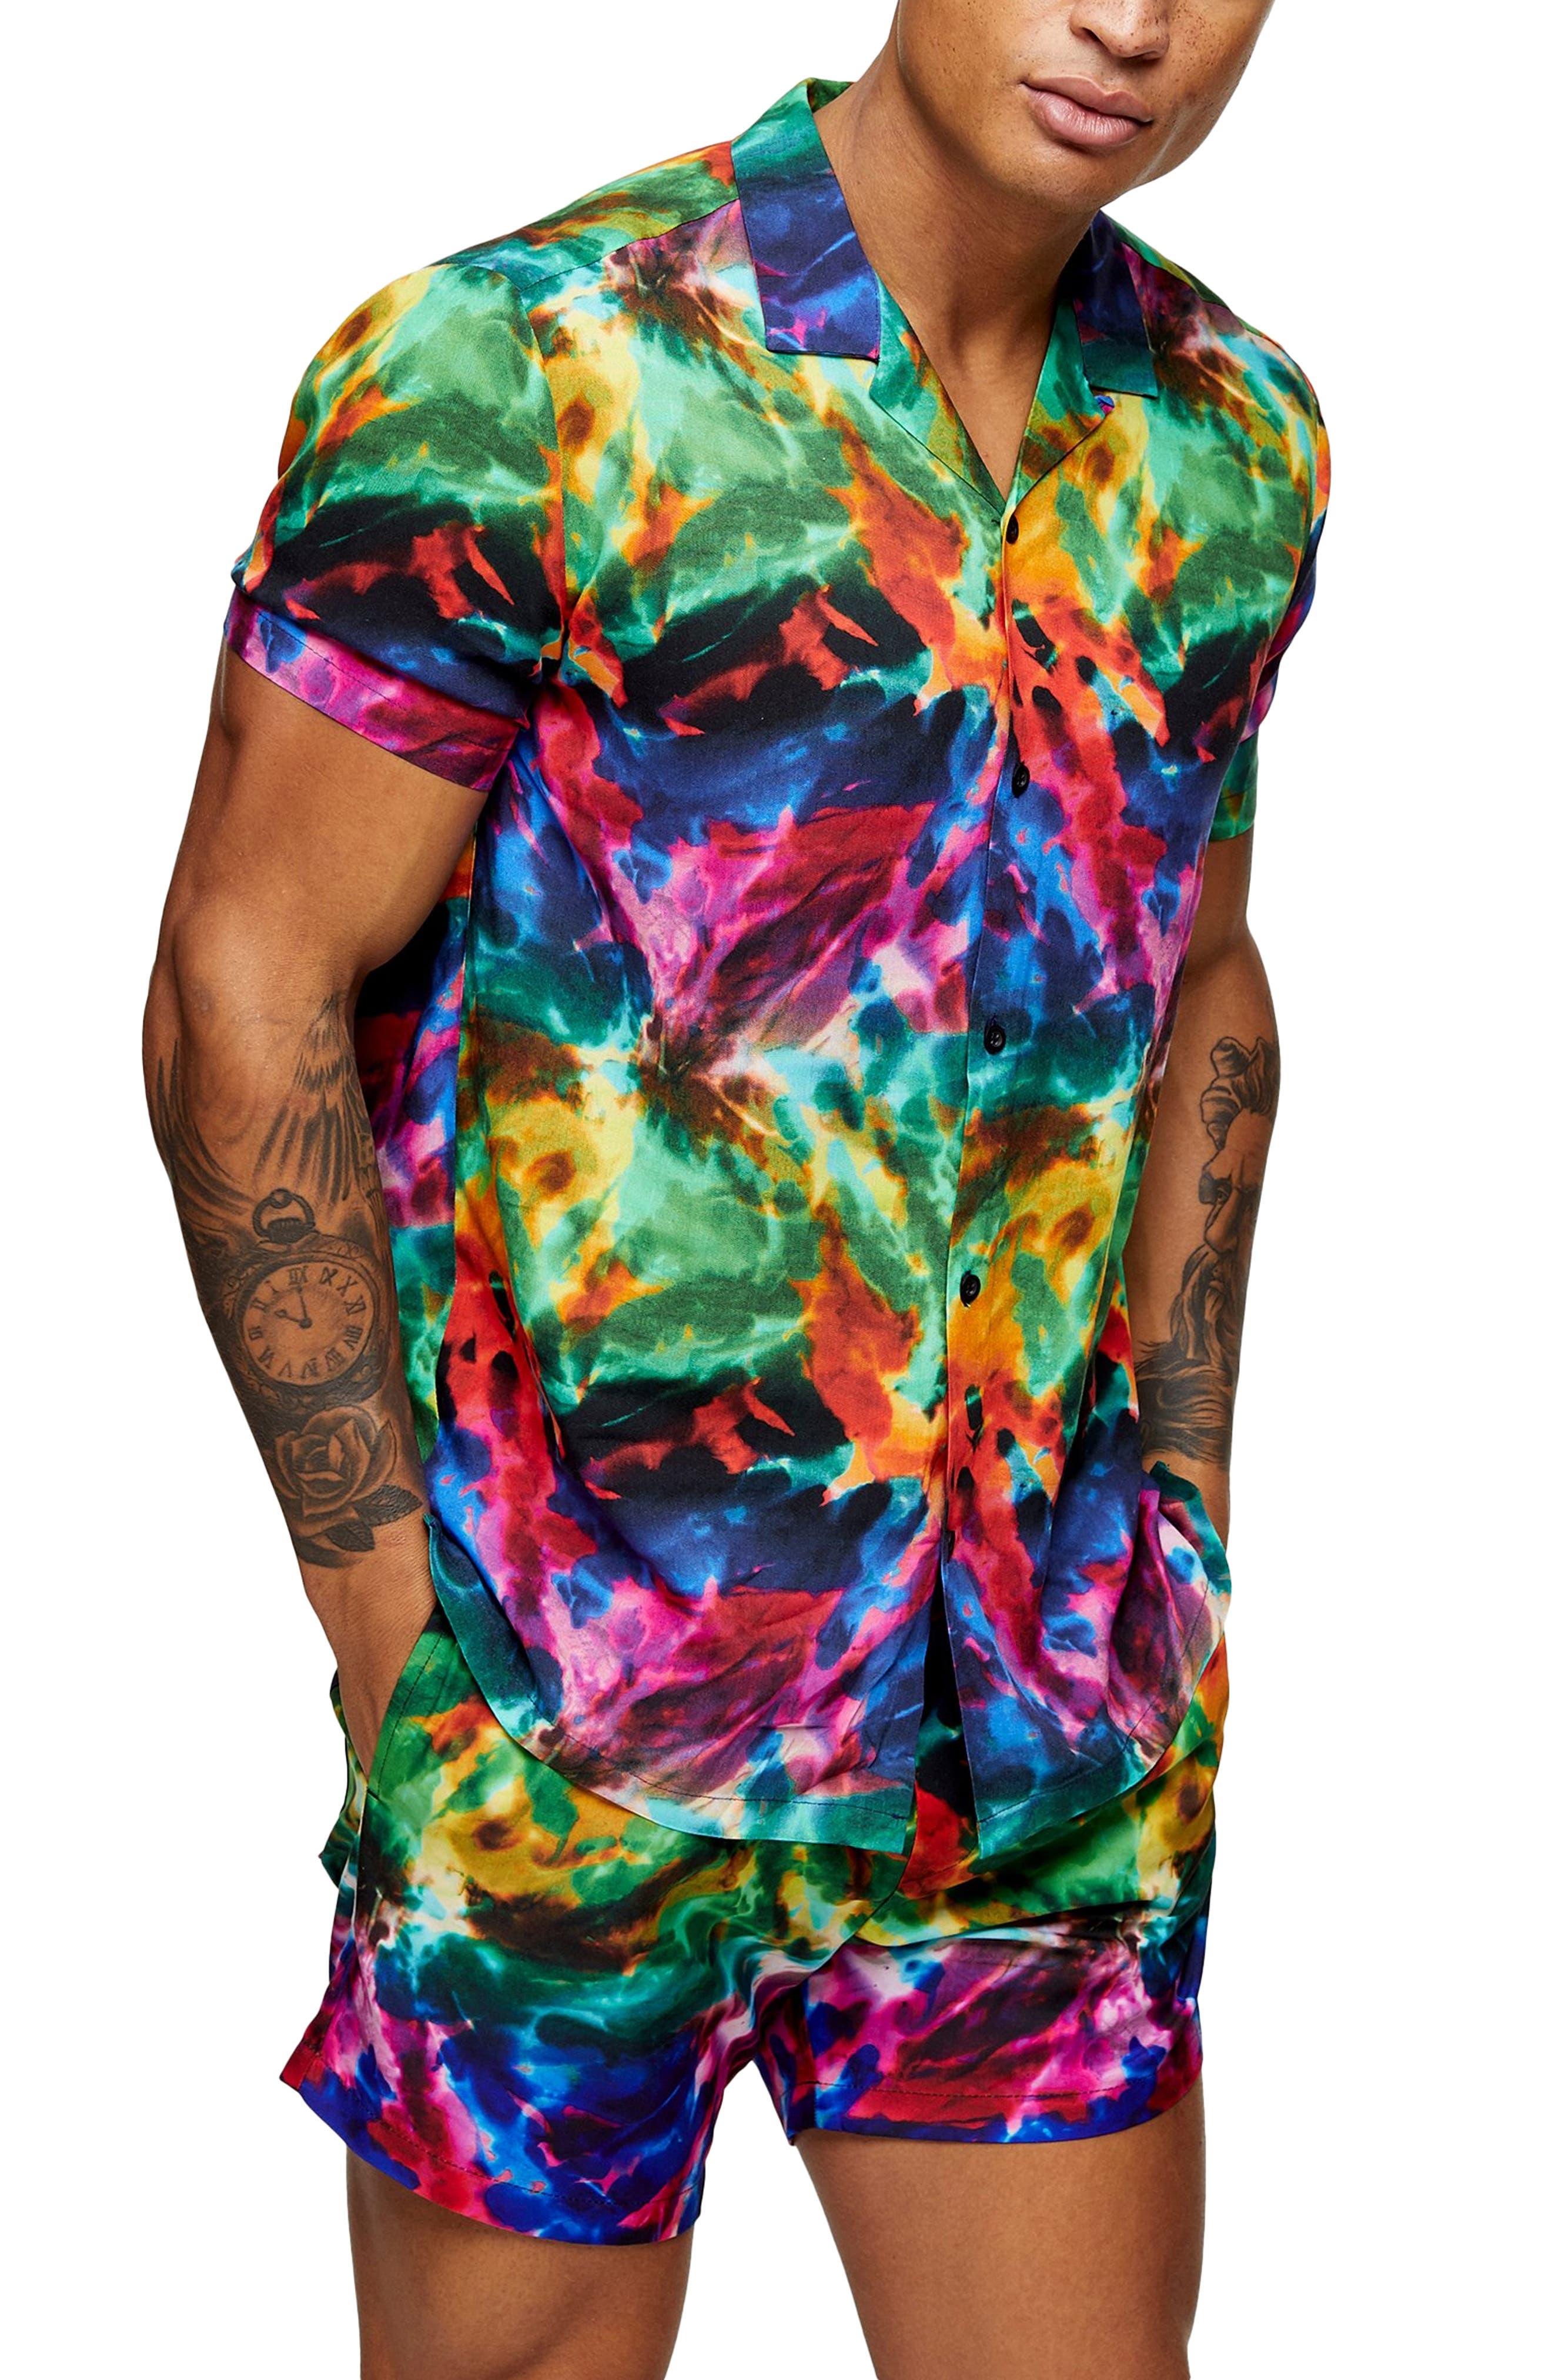 1960s Mens Shirts | 60s Mod Shirts, Hippie Shirts Mens Topman Pride Tie Dye Short Sleeve Button-Up Camp Shirt Size Large - None $27.00 AT vintagedancer.com